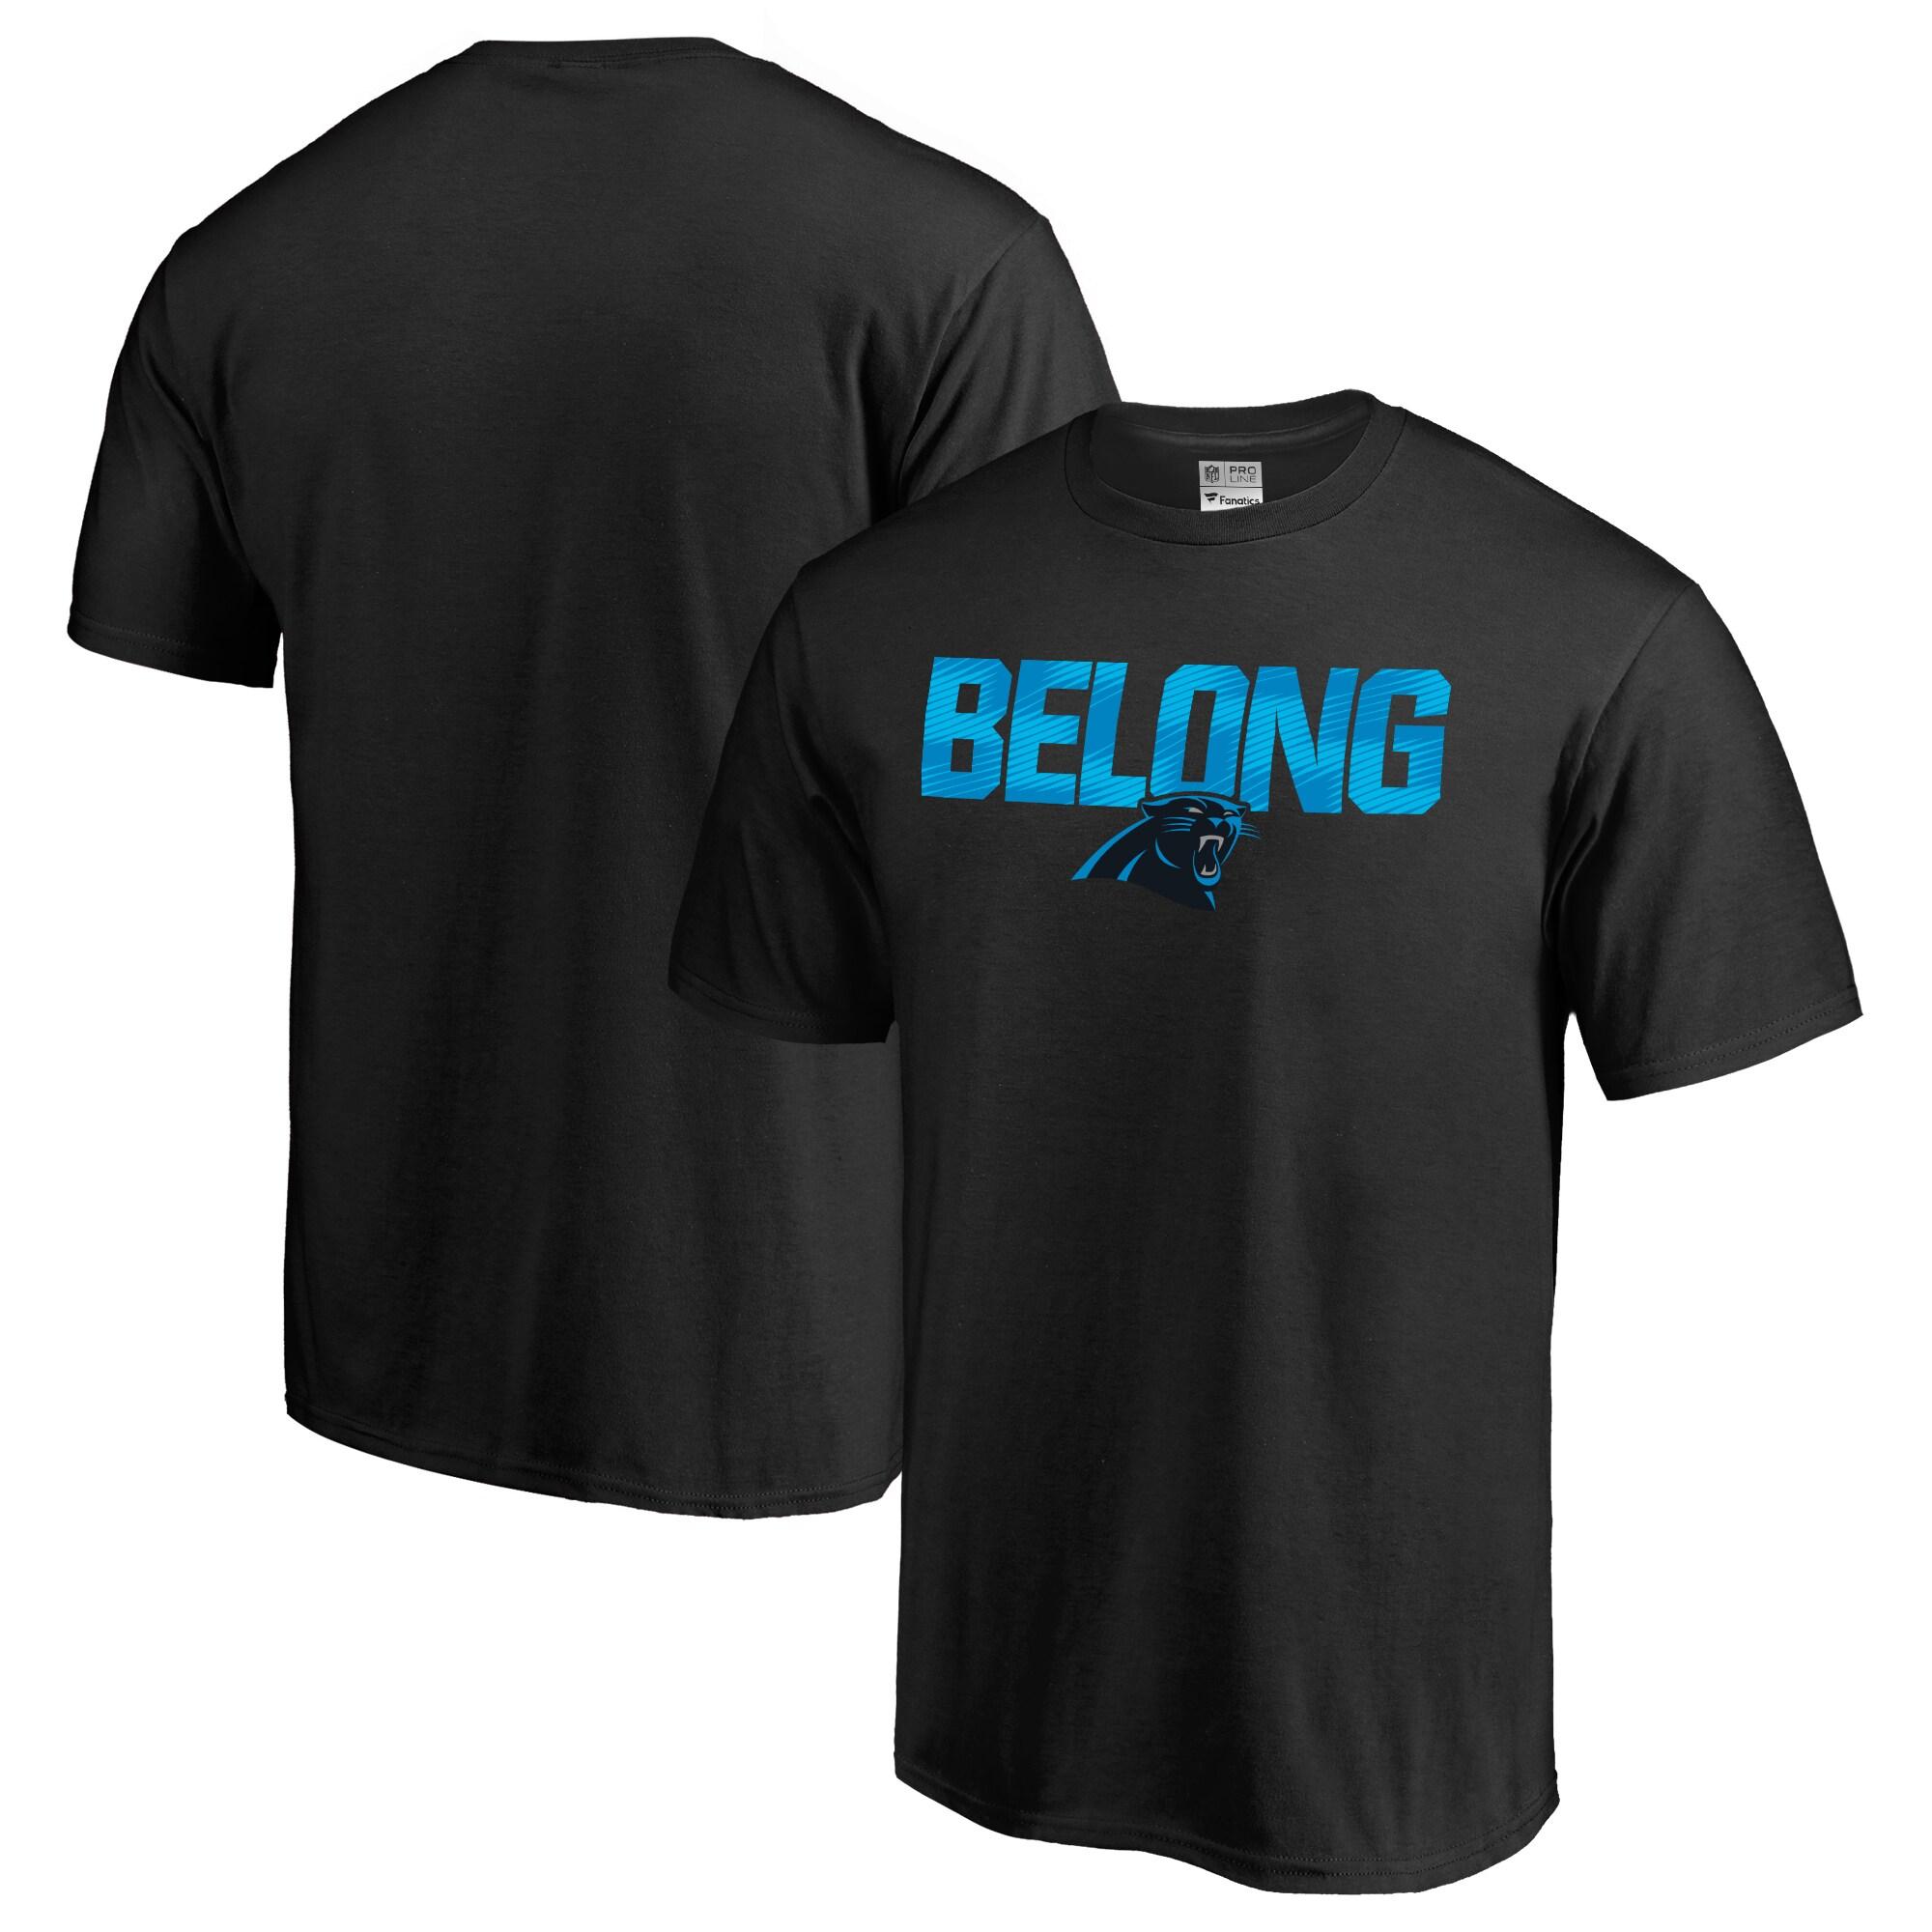 Carolina Panthers NFL Pro Line Big & Tall Mantra T-Shirt - Black